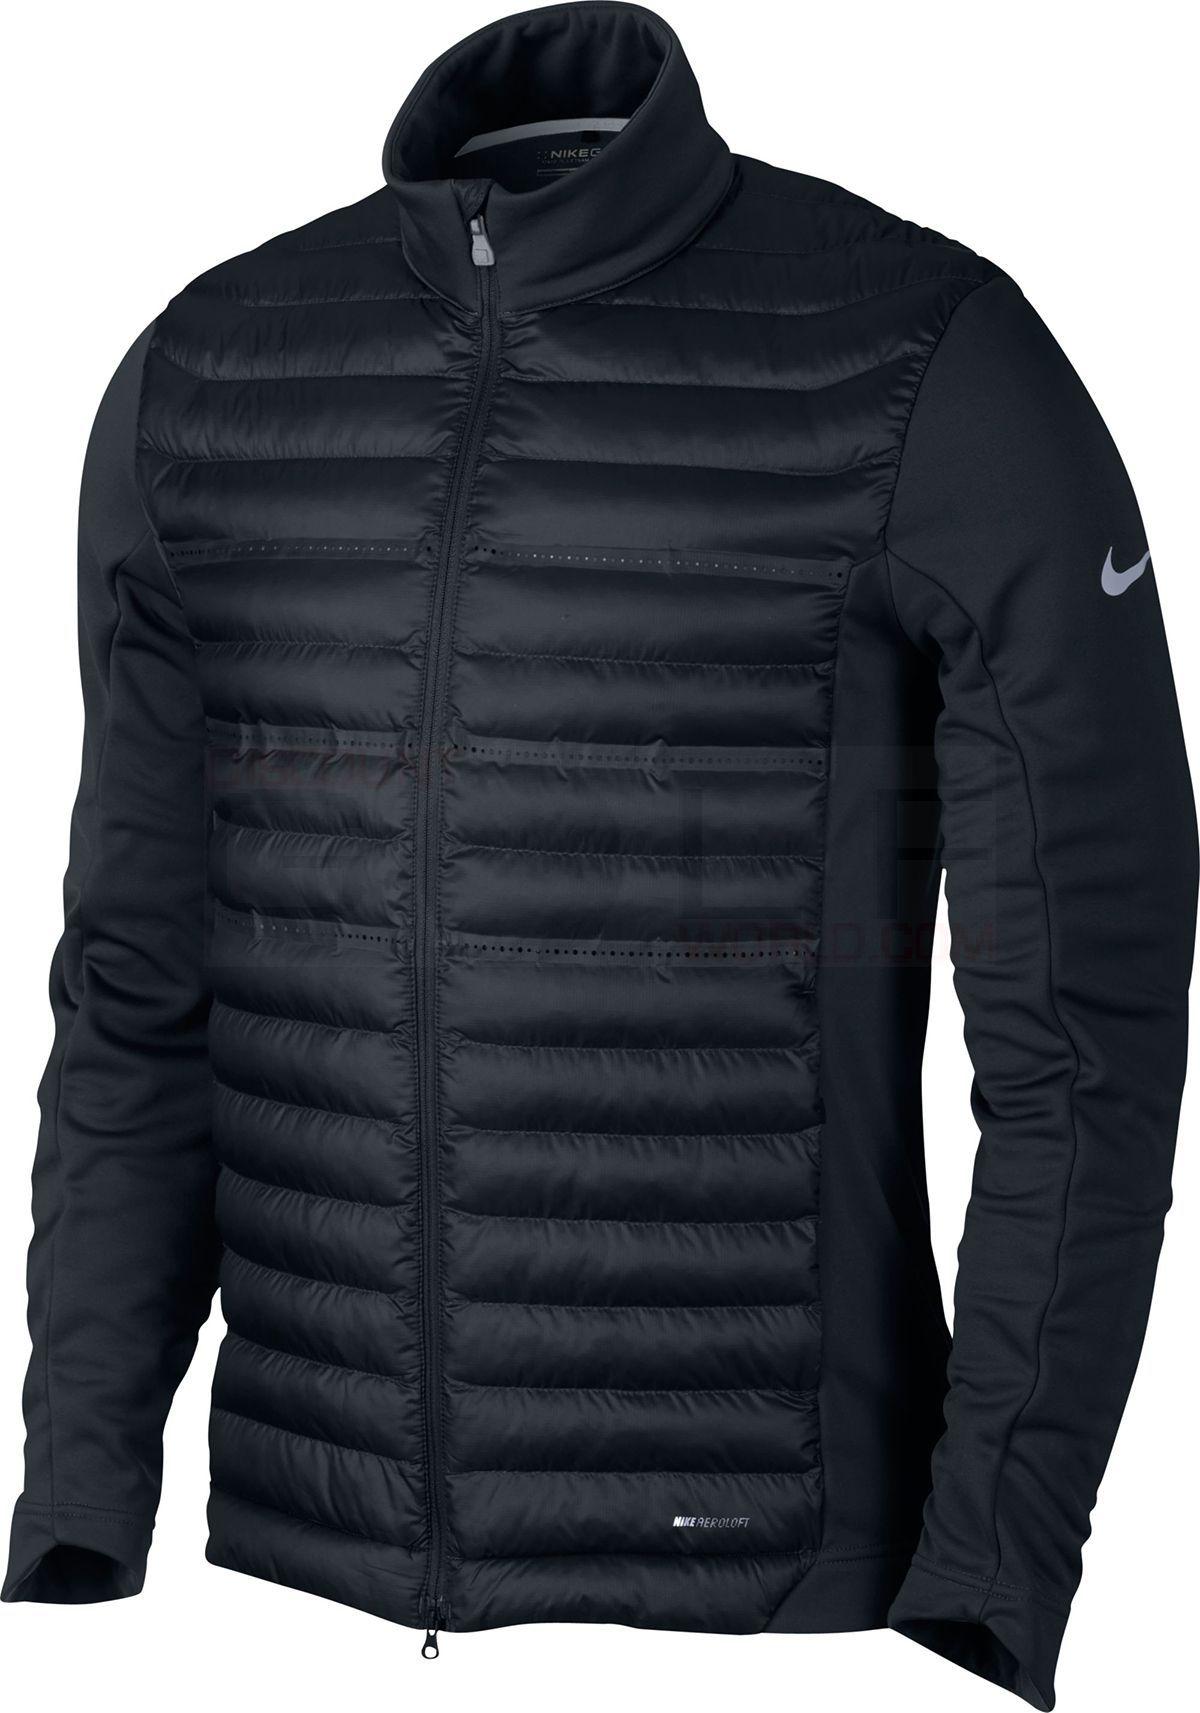 776bce69788b Nike AeroLoft Poly Filled Jacket 687016